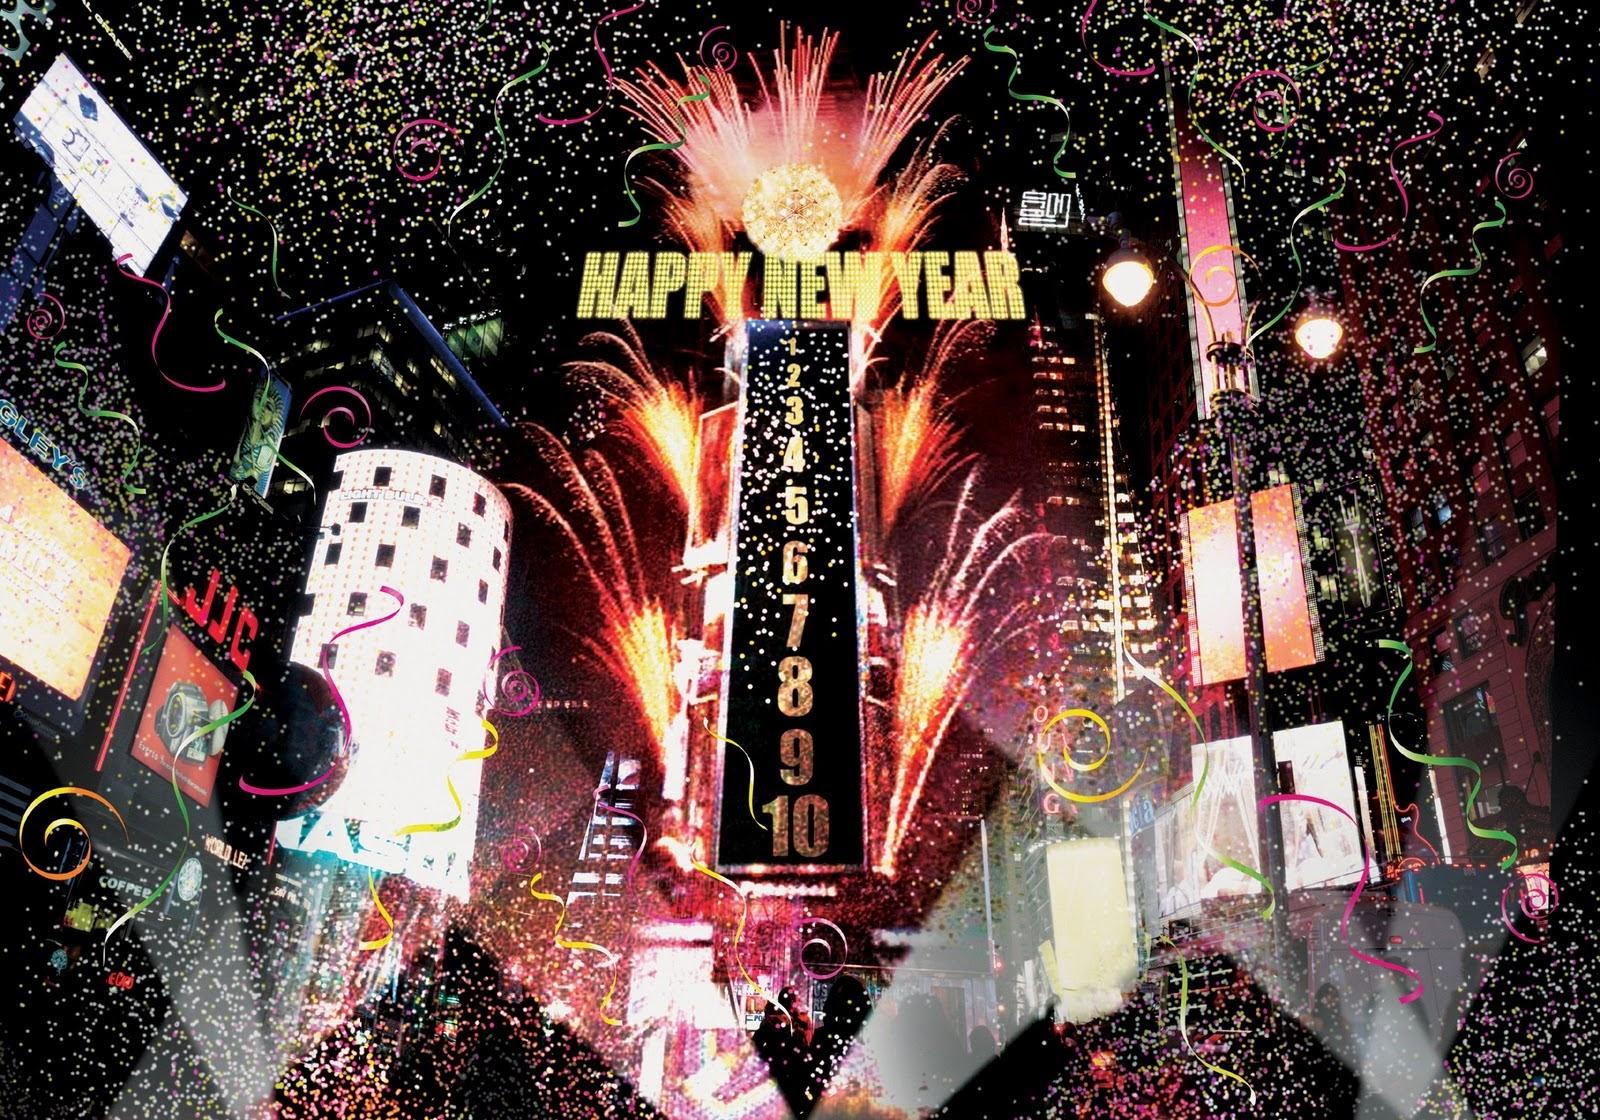 acara tahun baru, happy new year, 2015